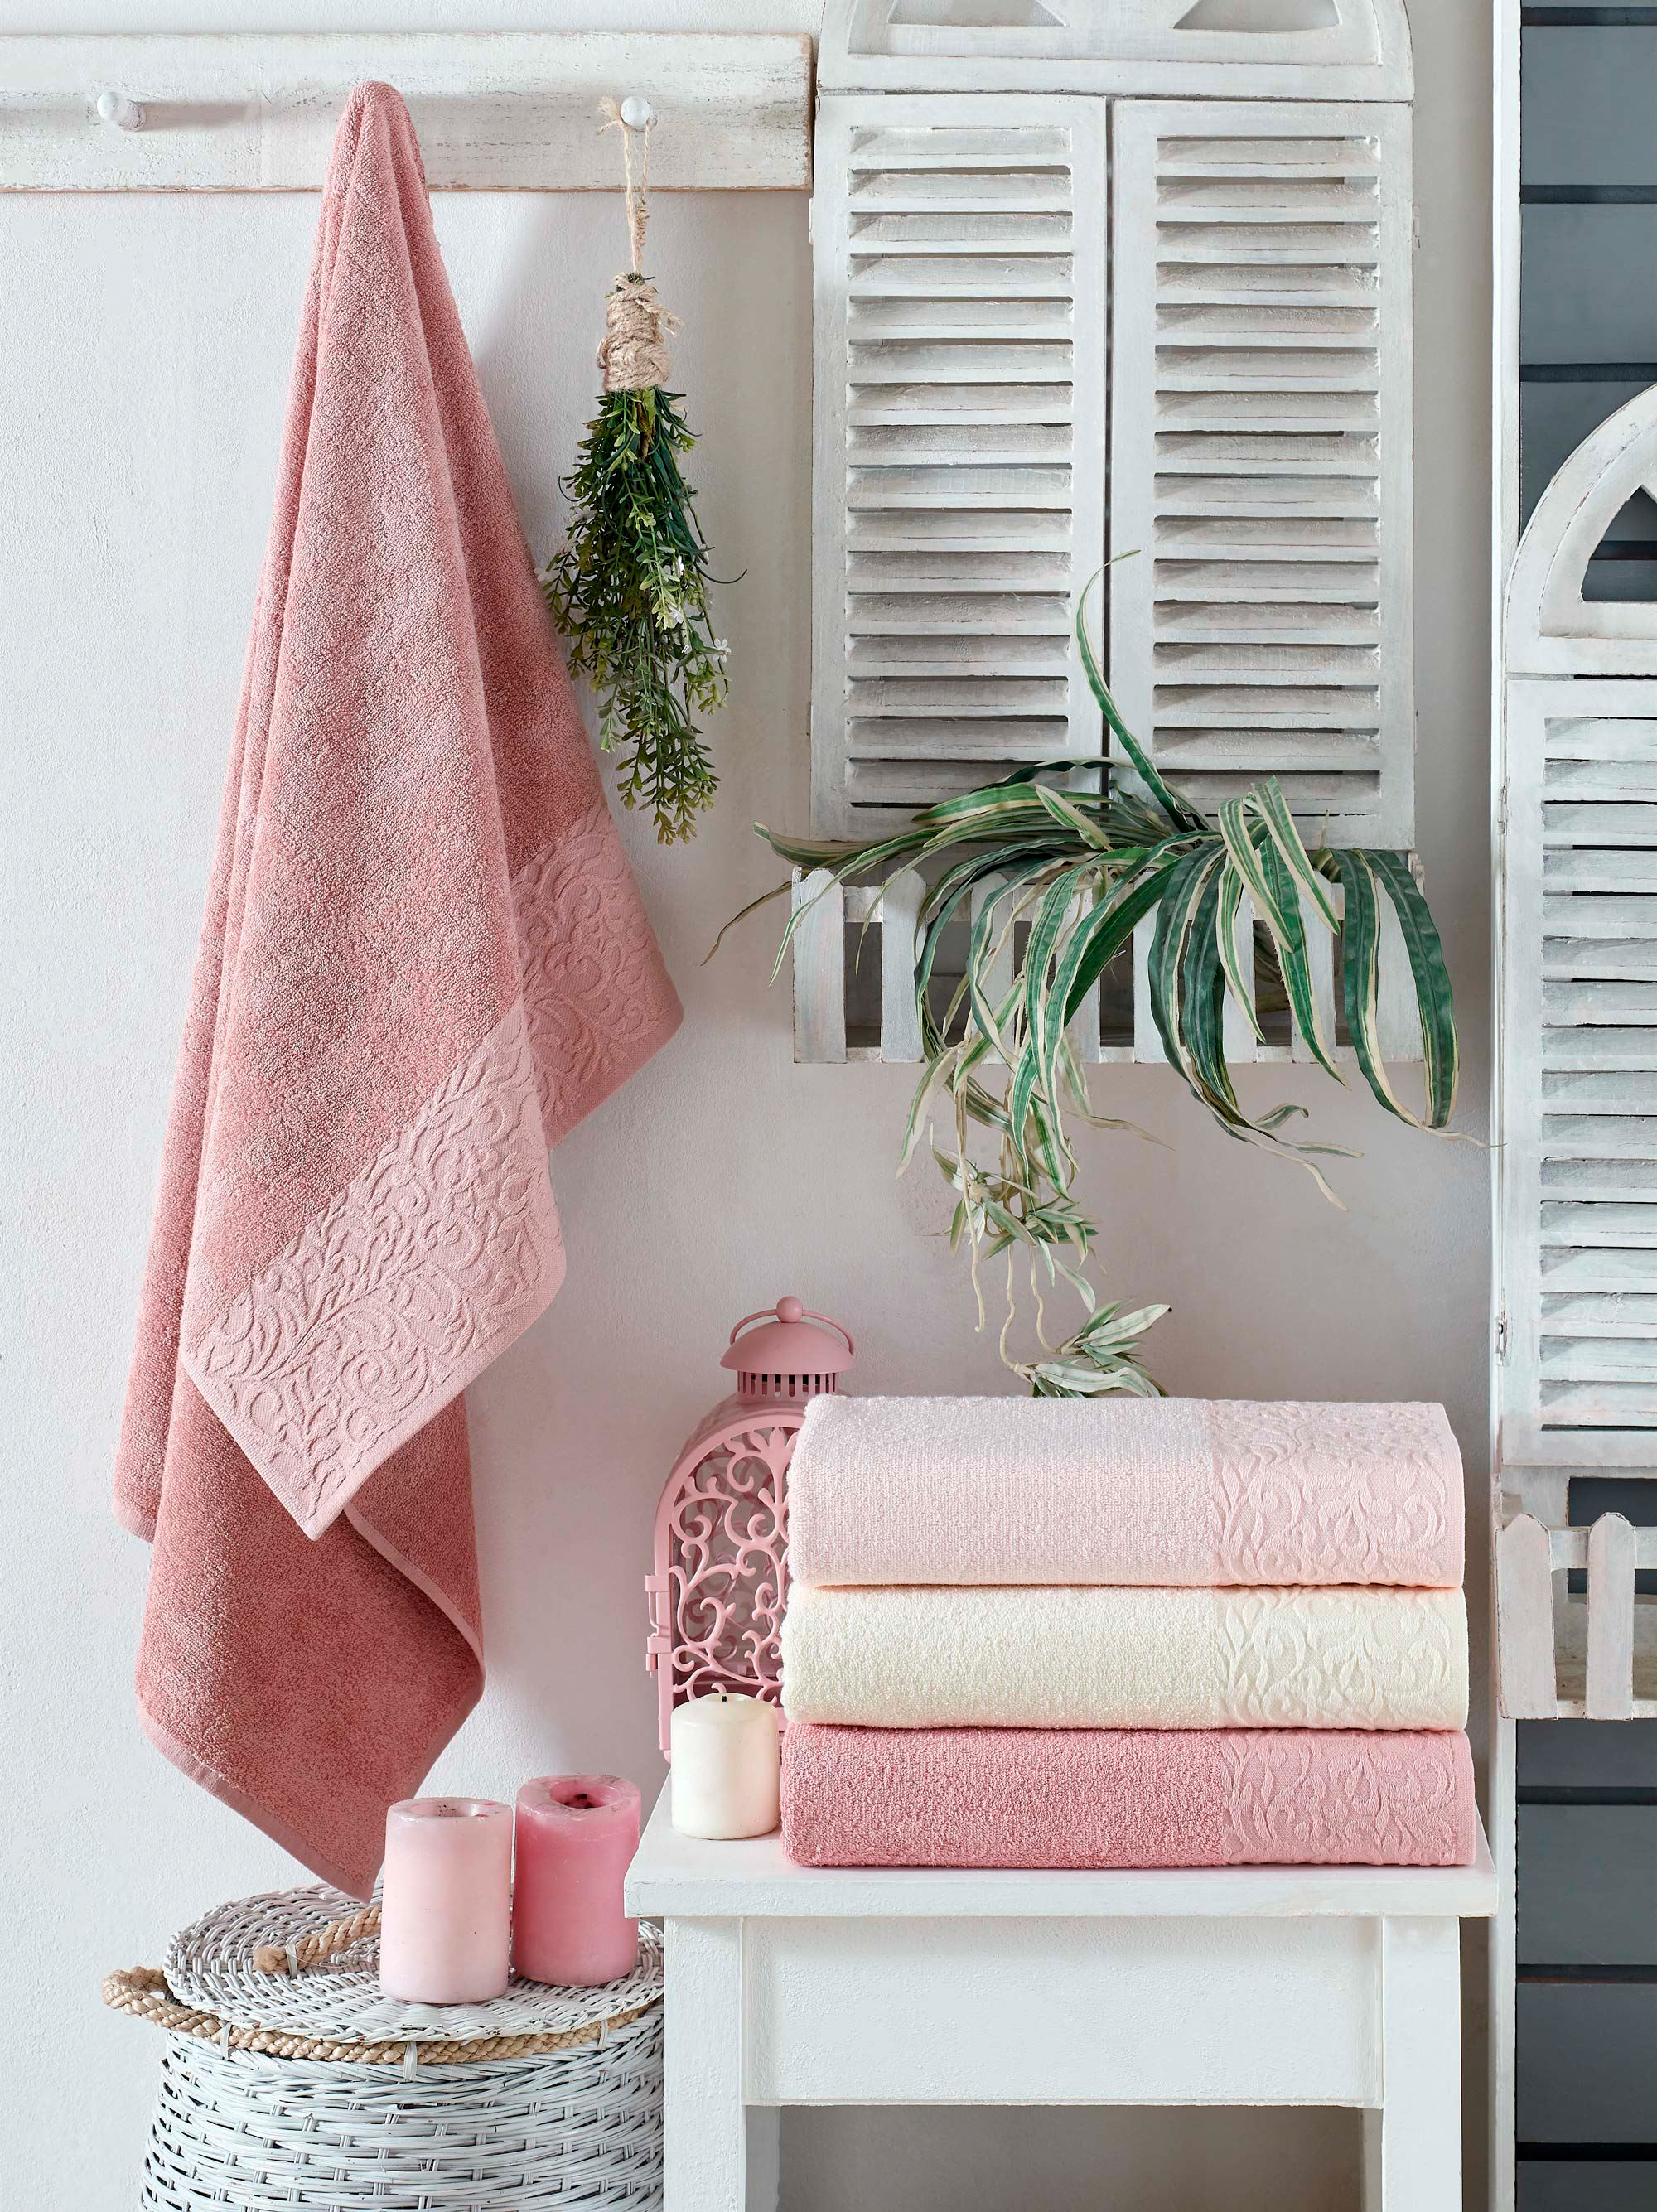 Купить Полотенца DO'n'CO, Полотенце Angelica (50х90 см - 4 шт), Турция, Белый, Розовый, Бамбук